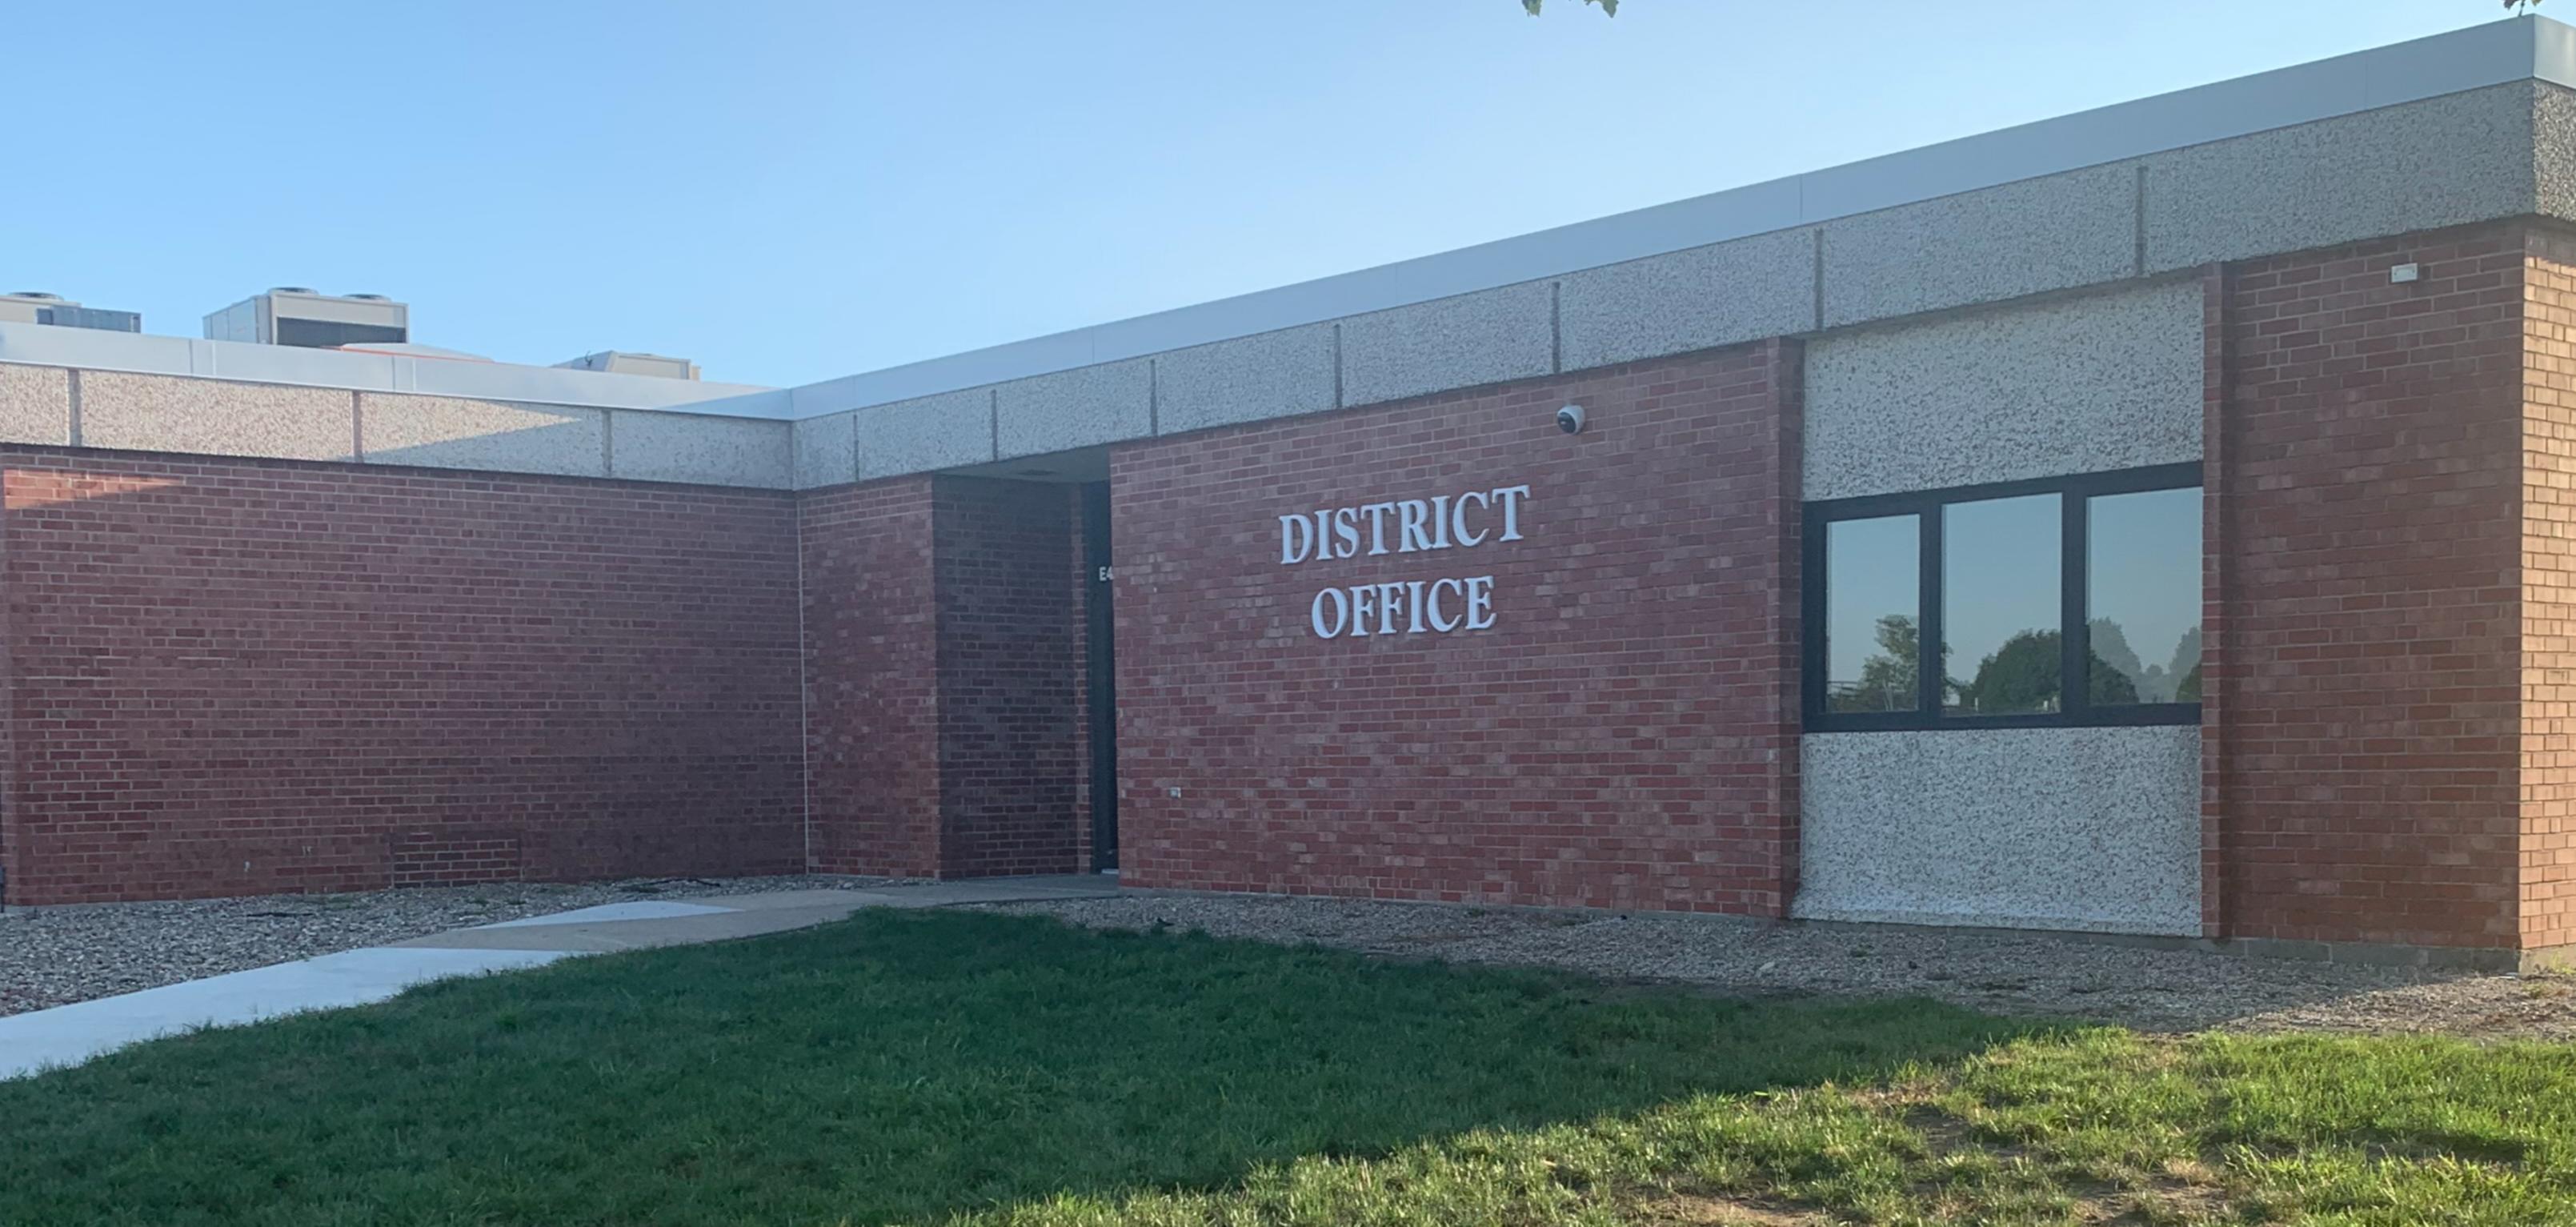 Greene County District Office - 101 Ram Drive